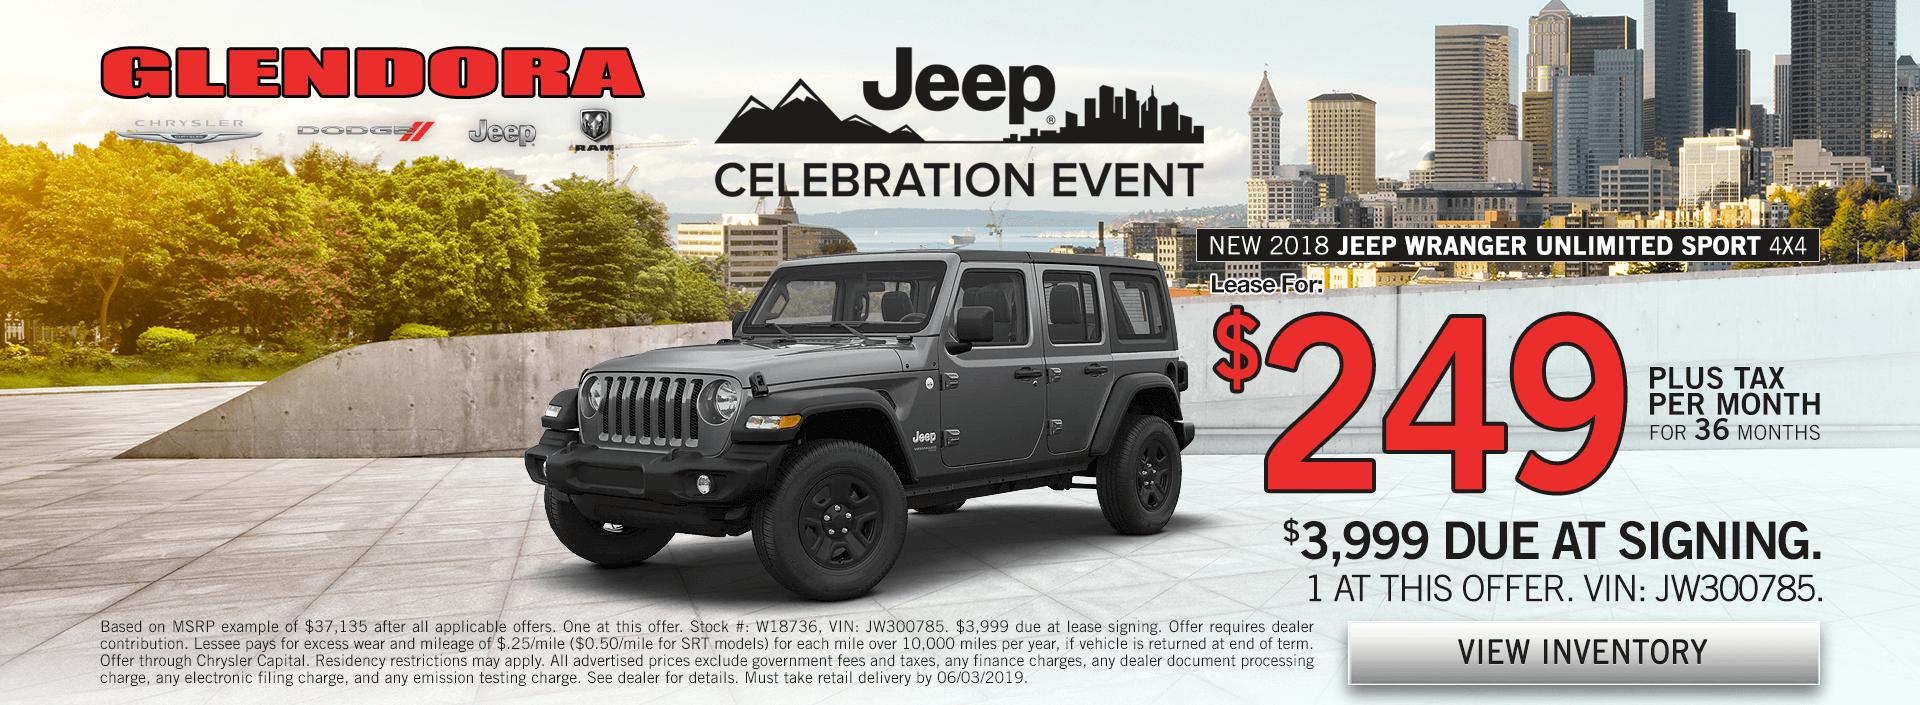 Jeep Wrangler Special Offer Deals